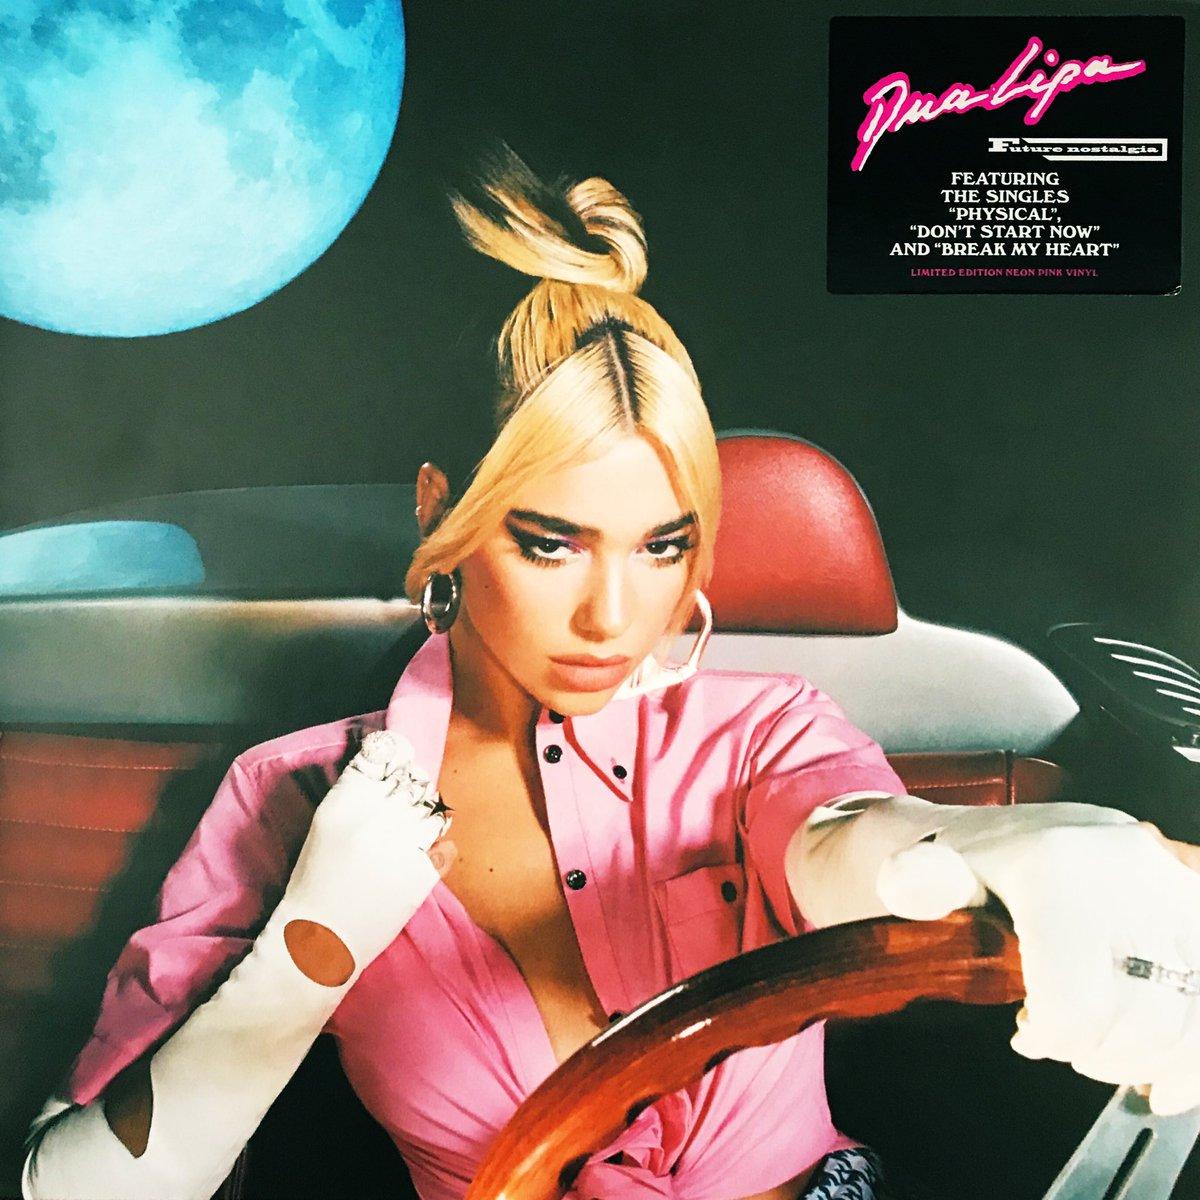 NowPlaying - Dua Lipa 'Future Nostalgia' (2020) - Released 27MAR20 / UK Chart peak 01 - Dua Lipa pink vinyl played on top the Prince love symbol slipmat  #NowPlaying #Dualipa #FutureNostalgia #Vinyl #Prince @DUALIPApic.twitter.com/Kq76fpFsy0